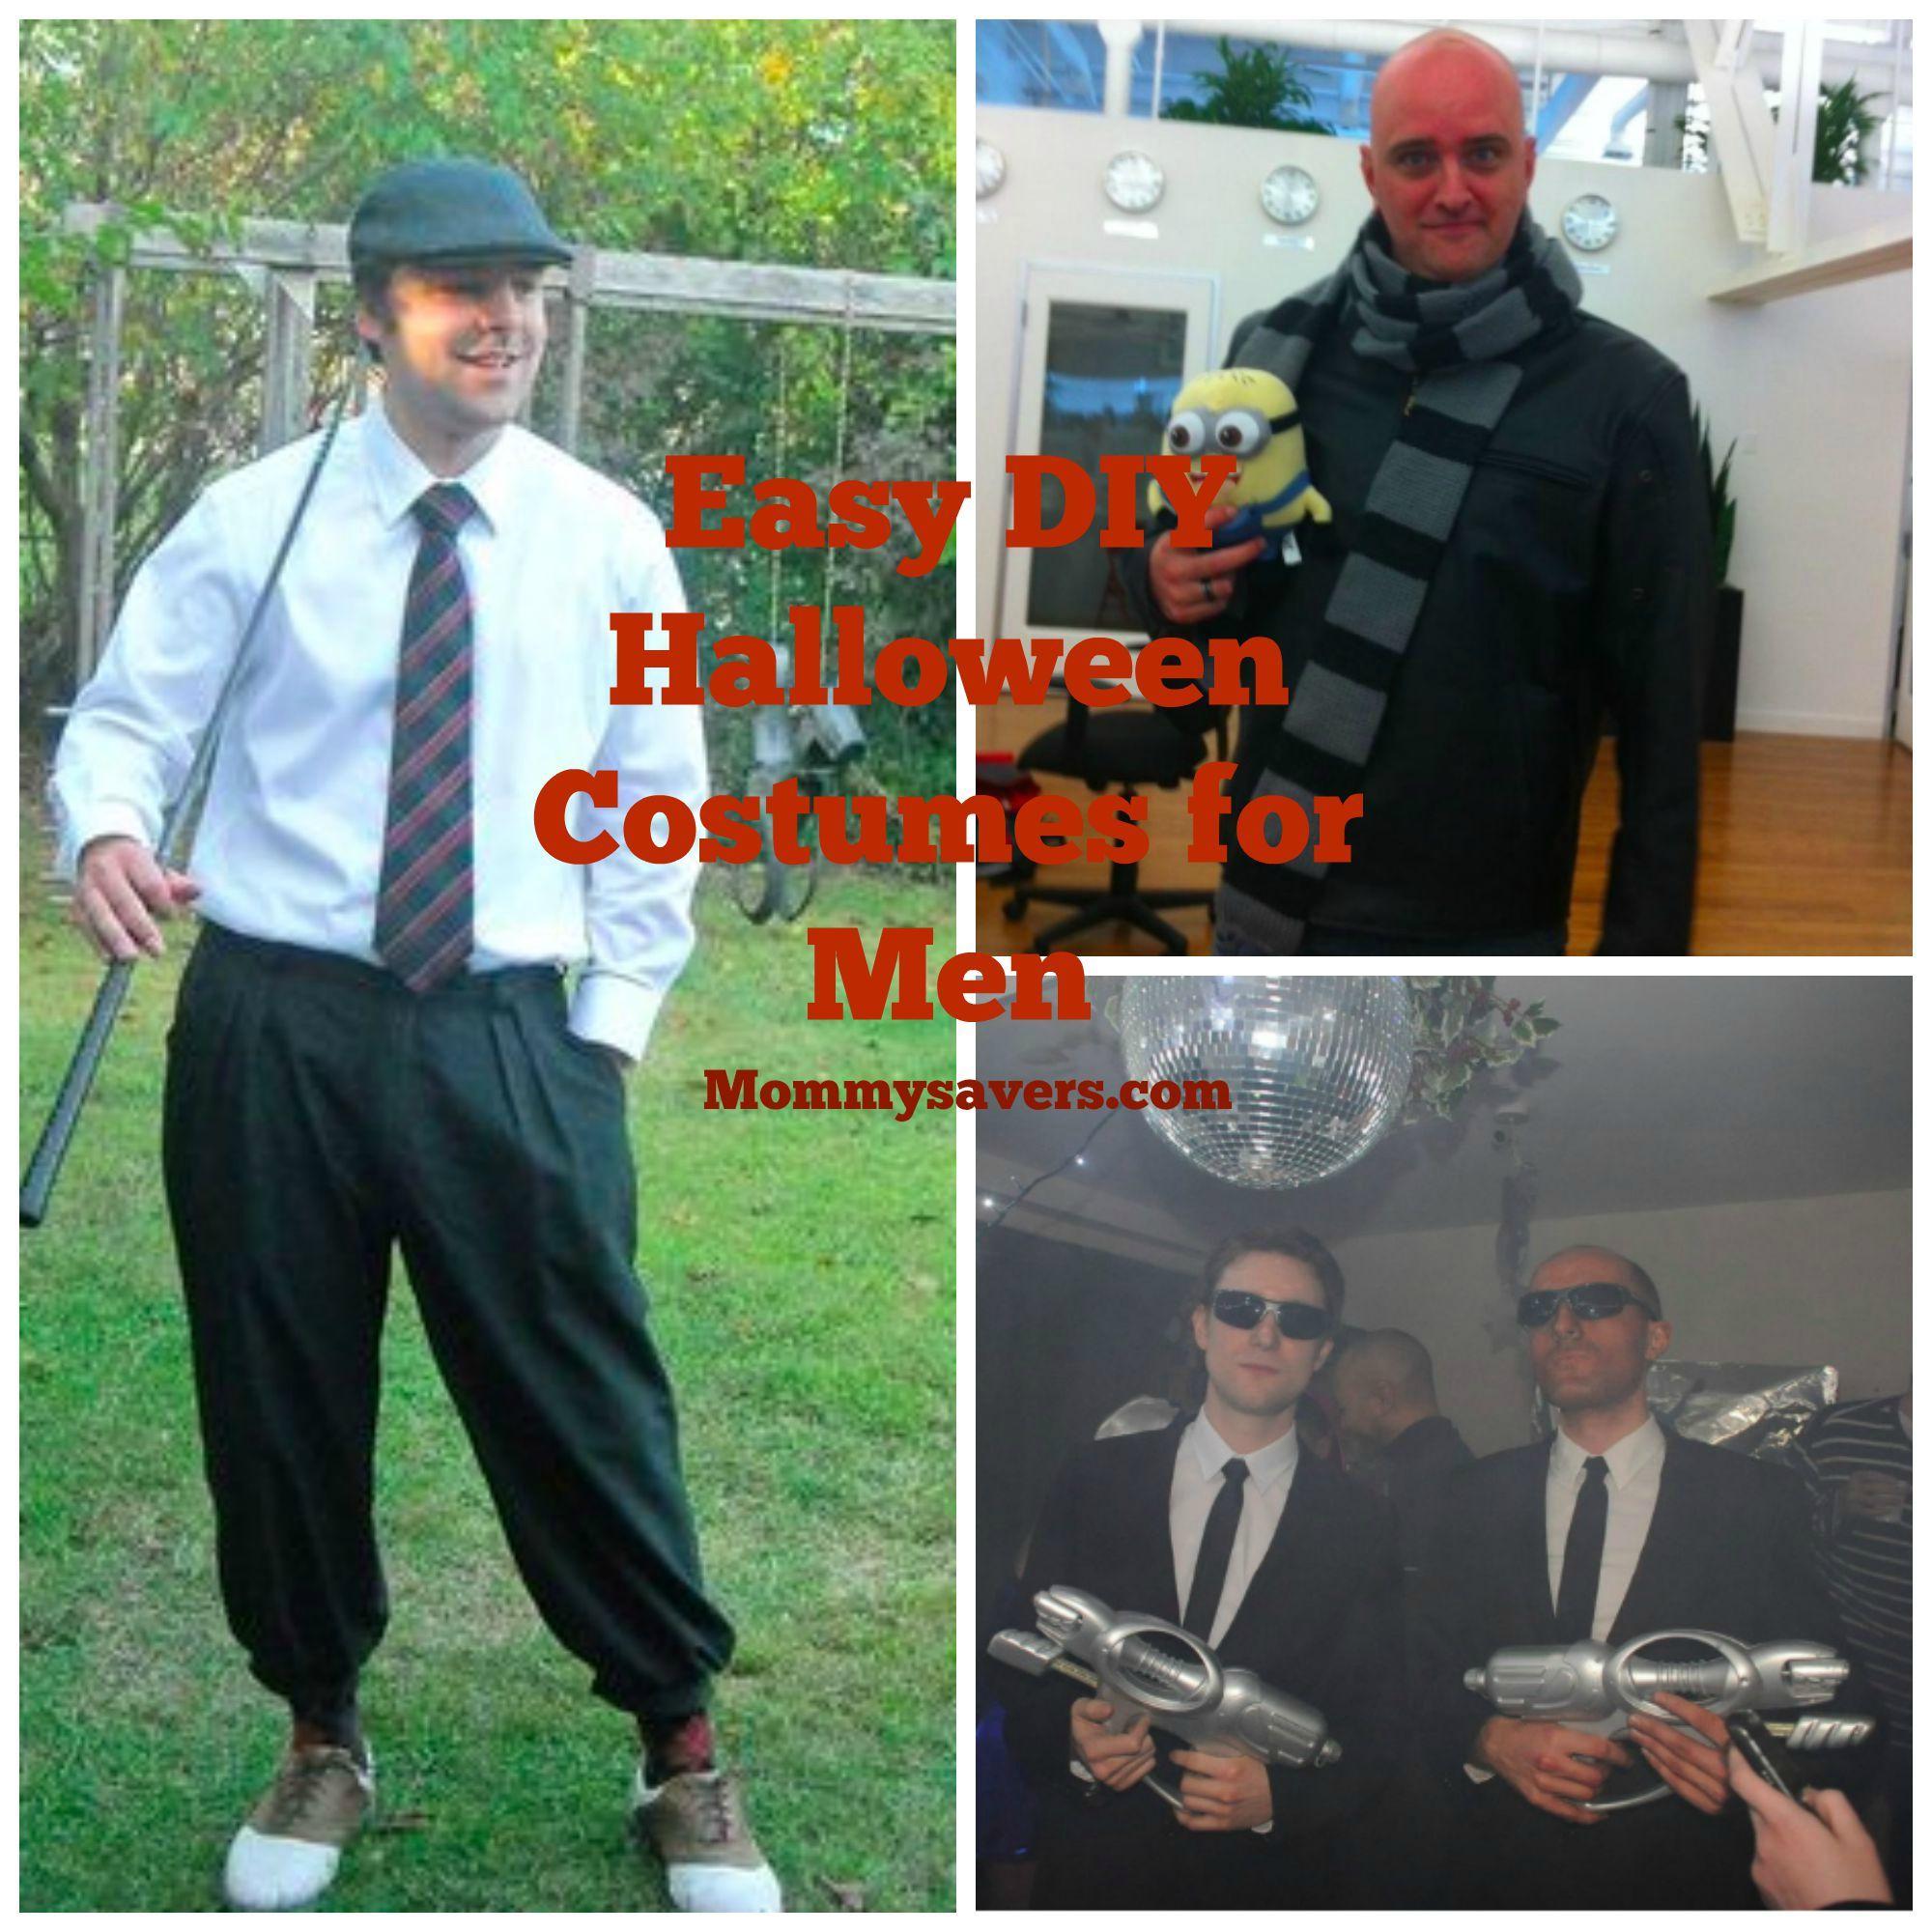 Diy easy halloween costume ideas for men fall favorites diy easy halloween costume ideas for men solutioingenieria Choice Image